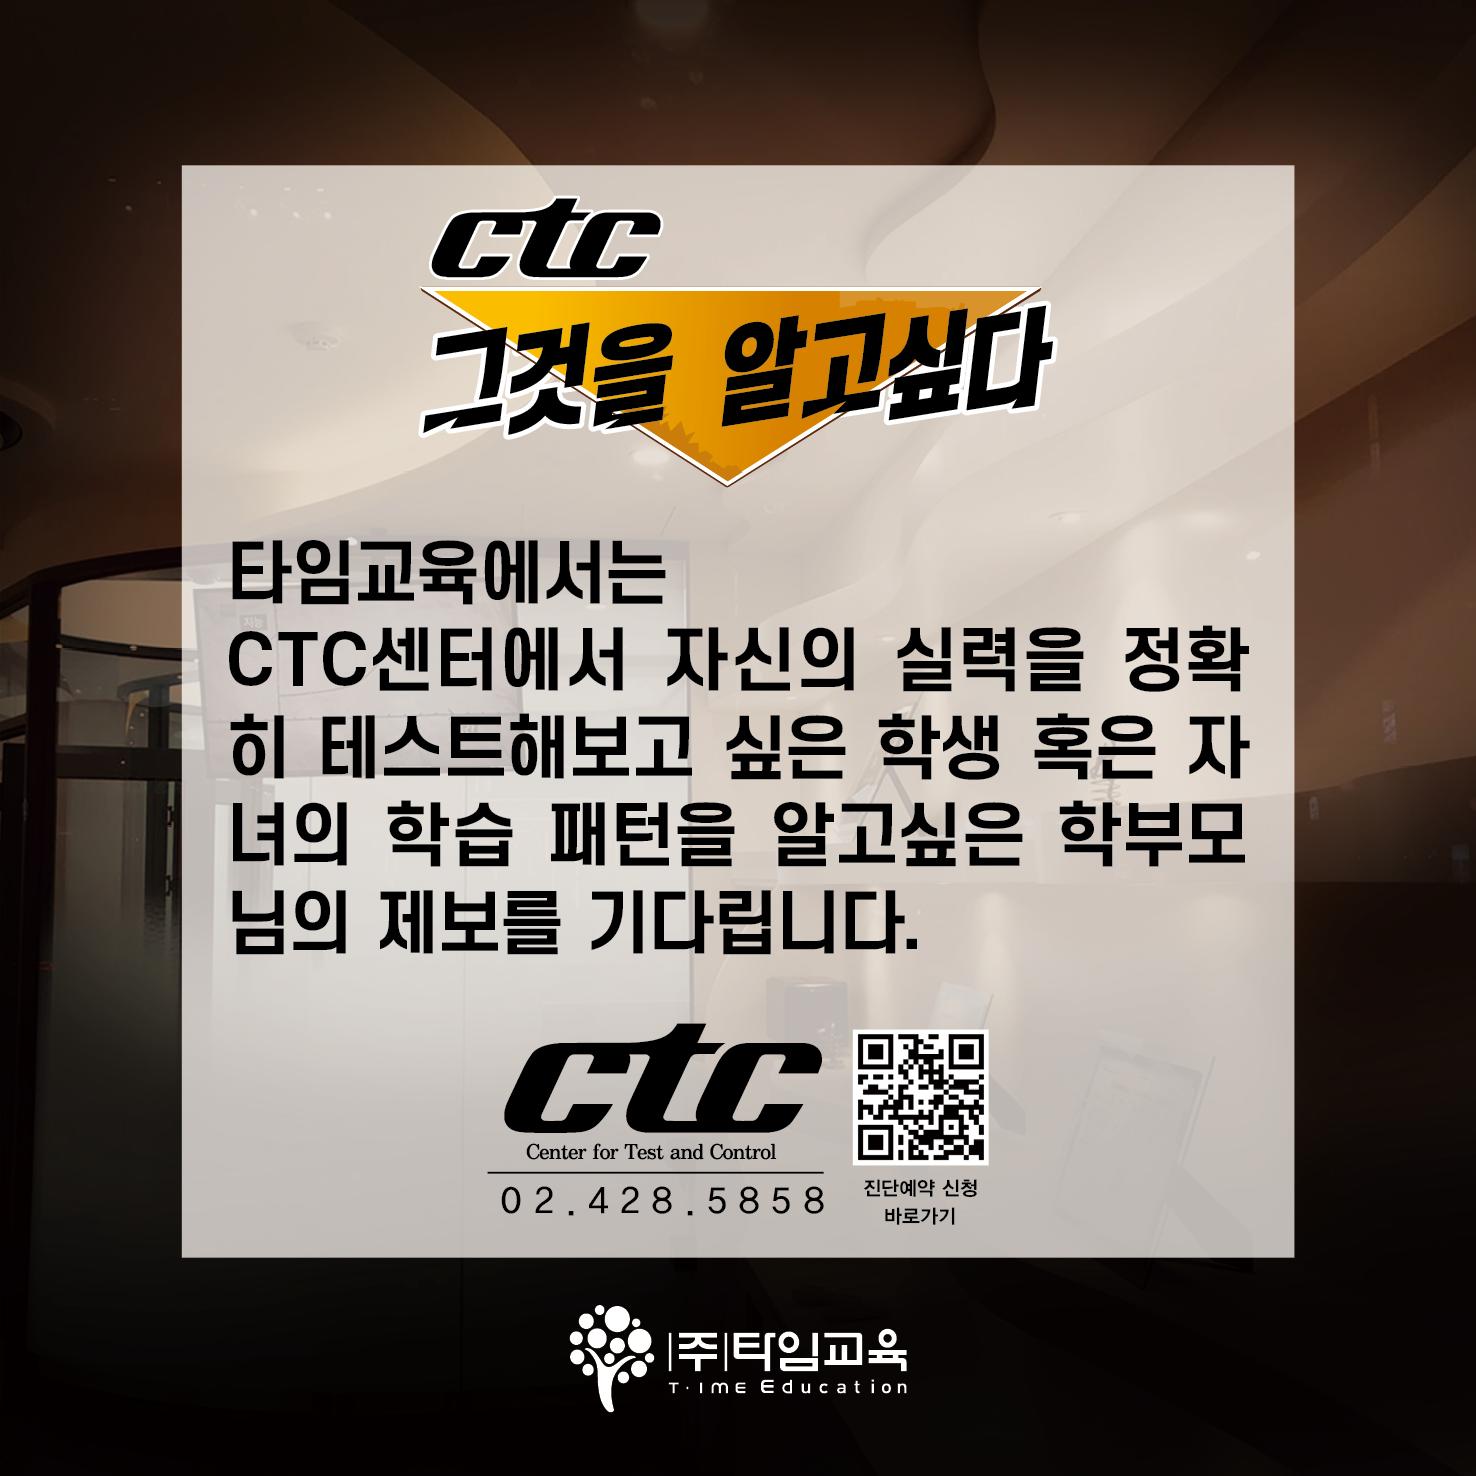 ctc 그것이 알고싶다_9